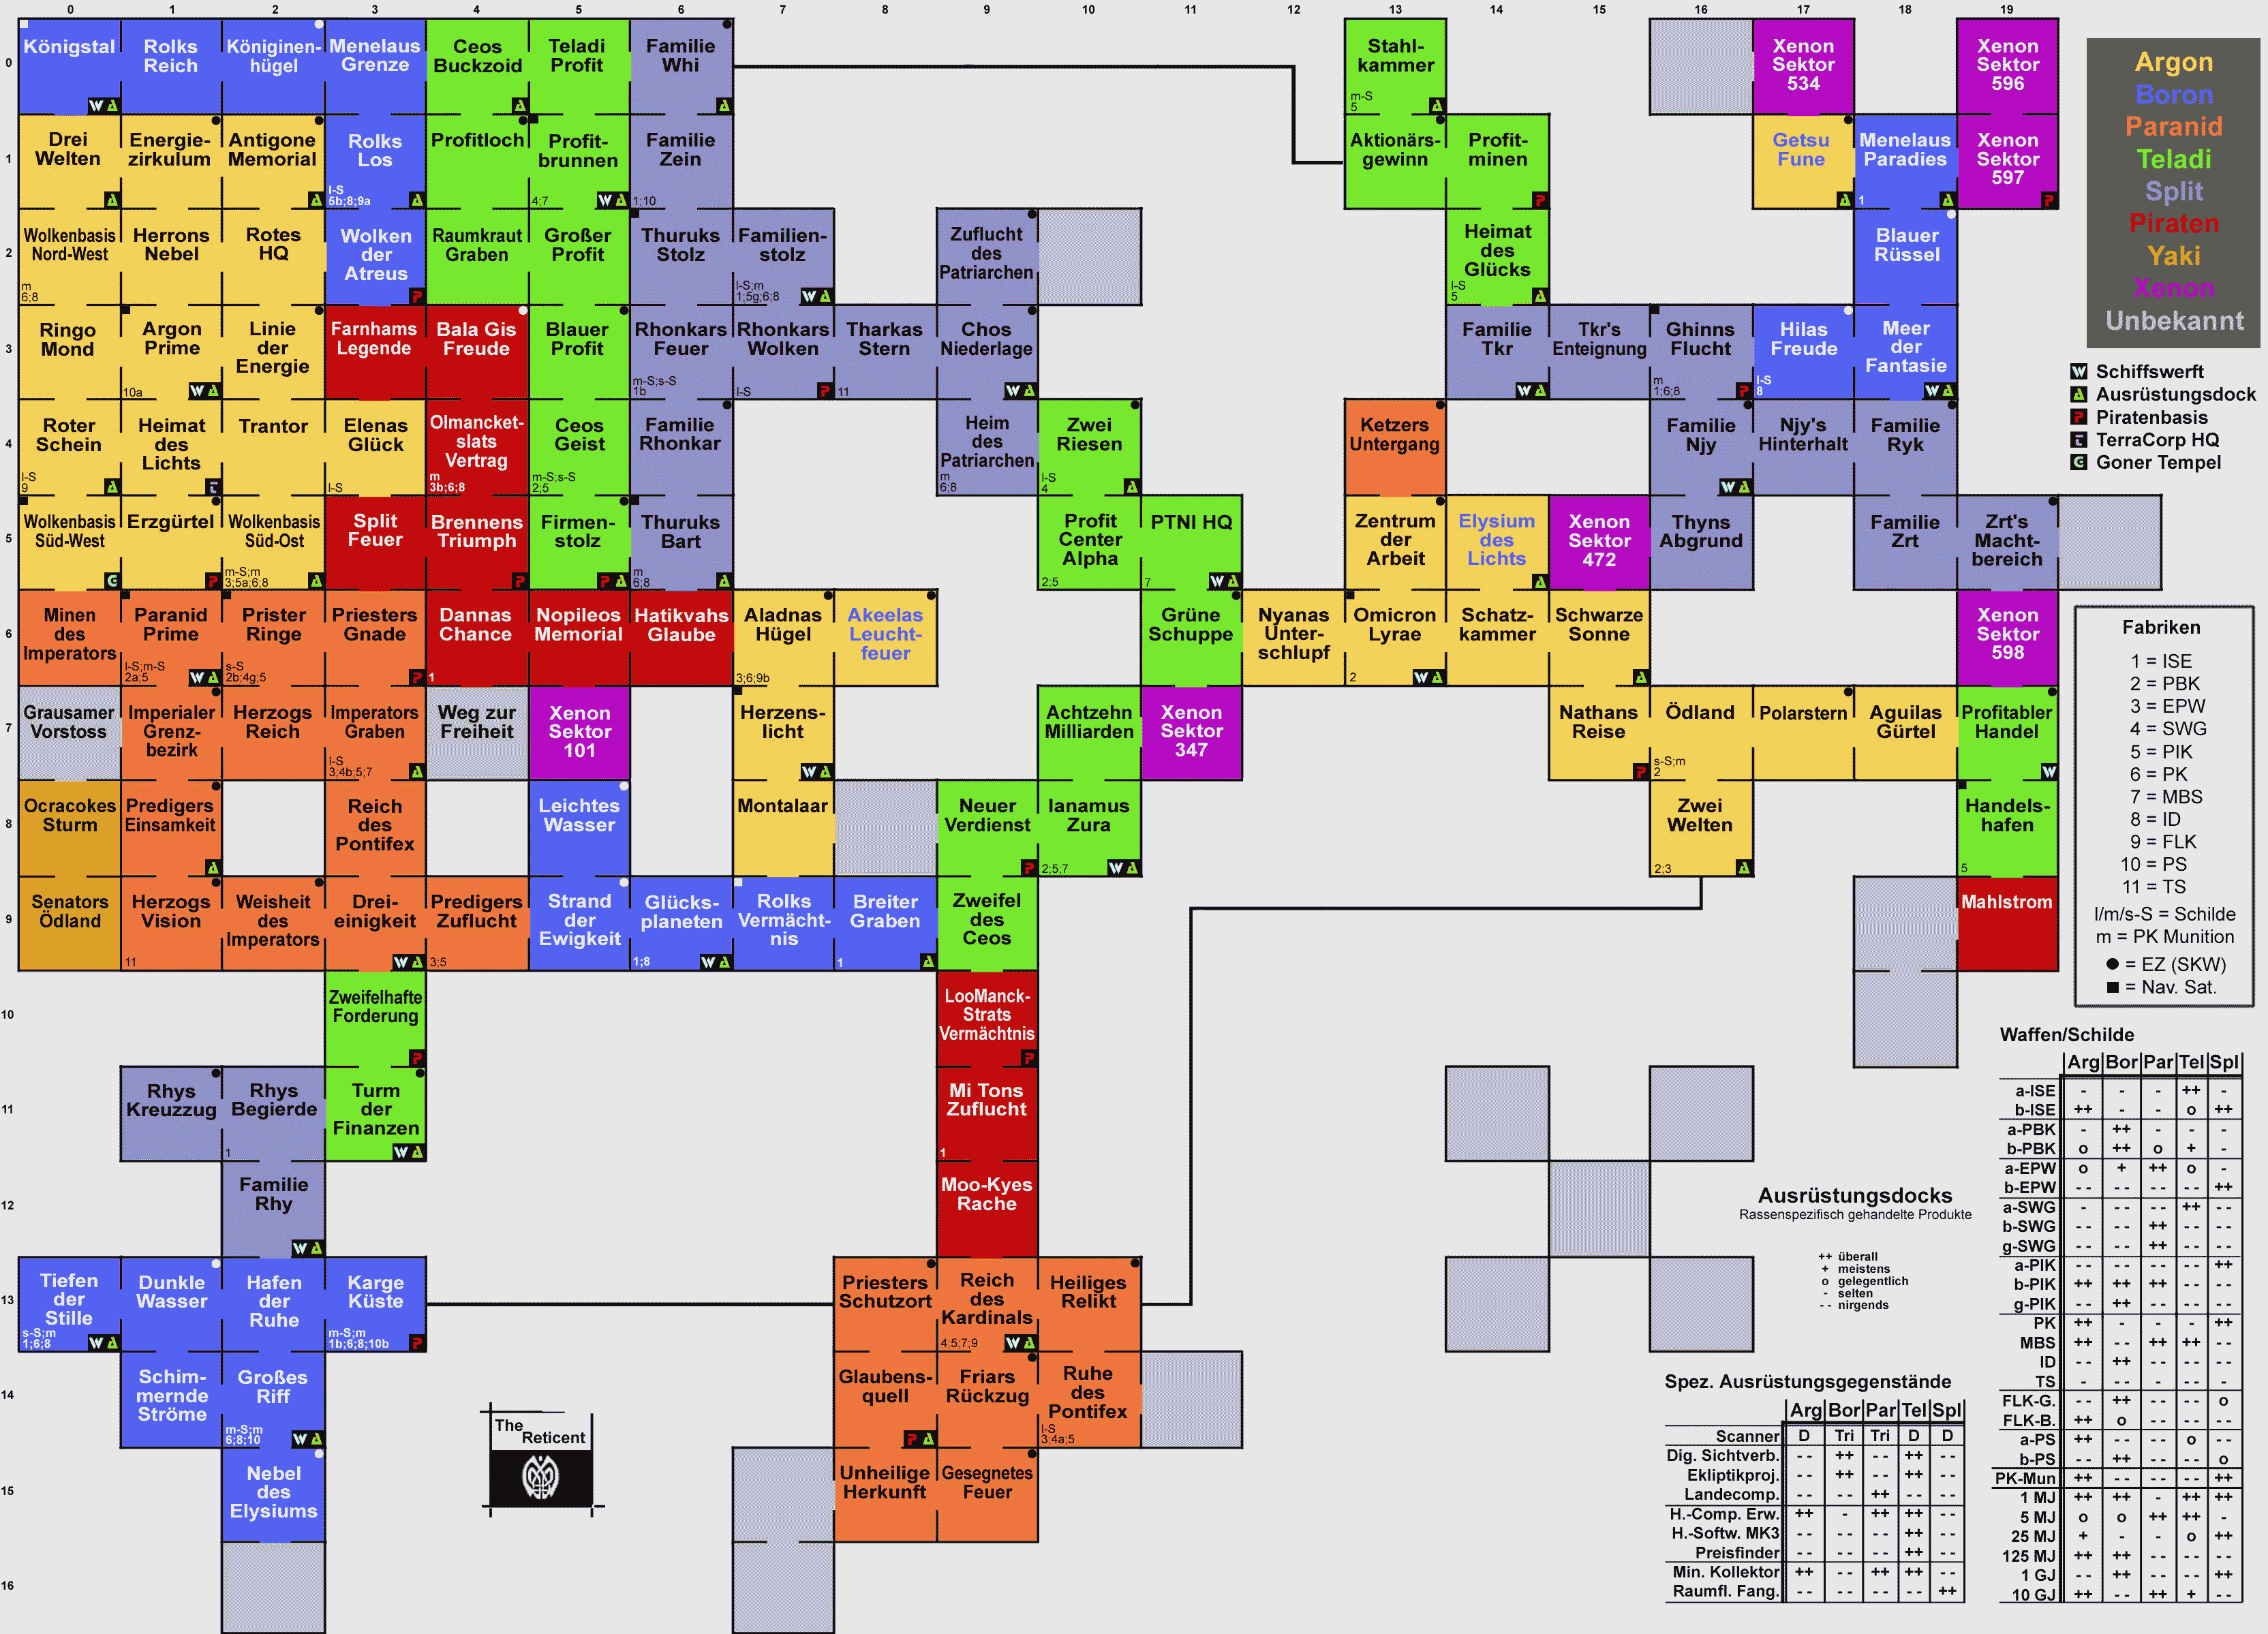 X3 Reunion Karte.Blog Posts Sunfasr